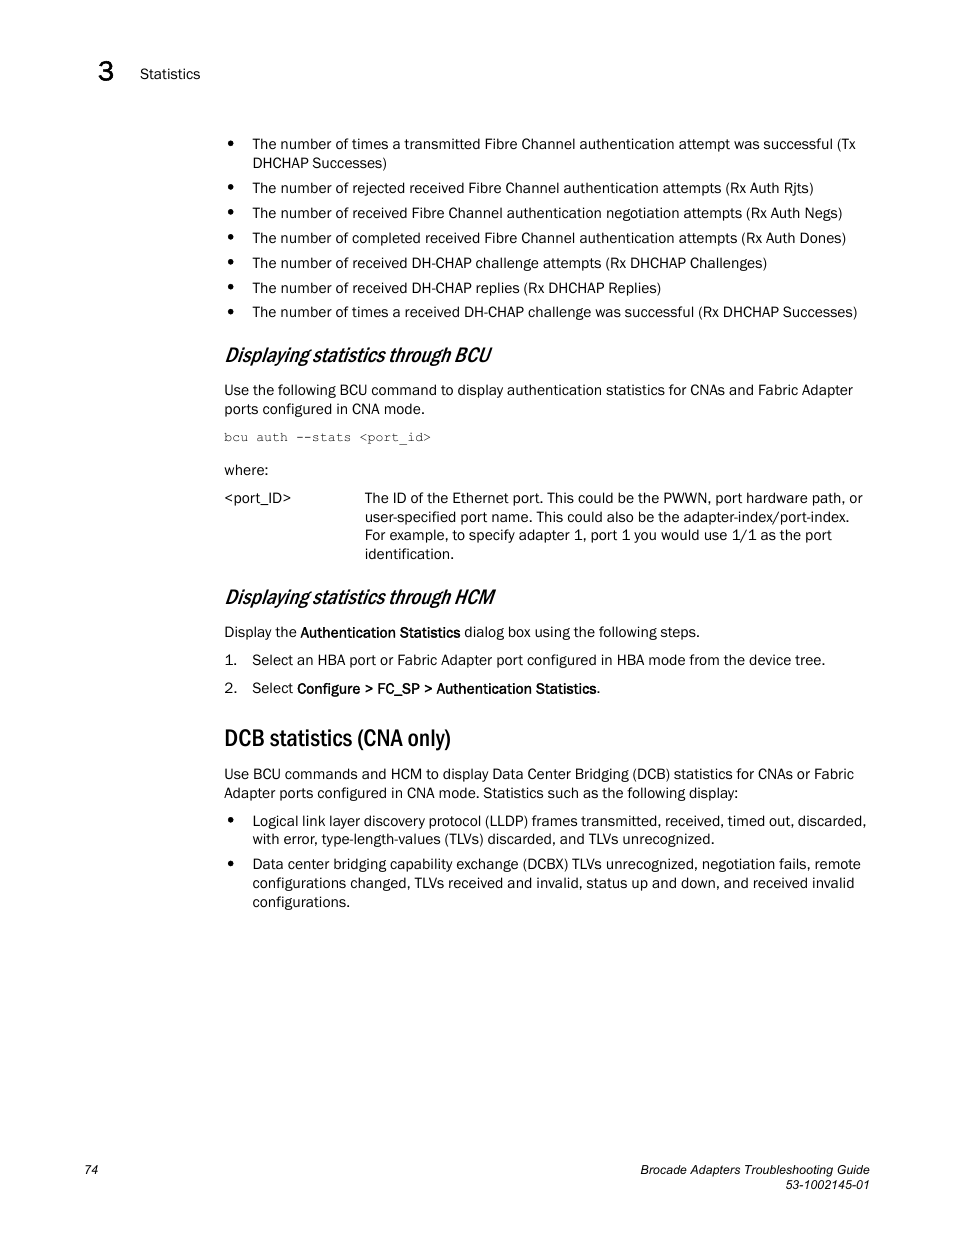 Dcb statistics (cna only), Displaying statistics through bcu